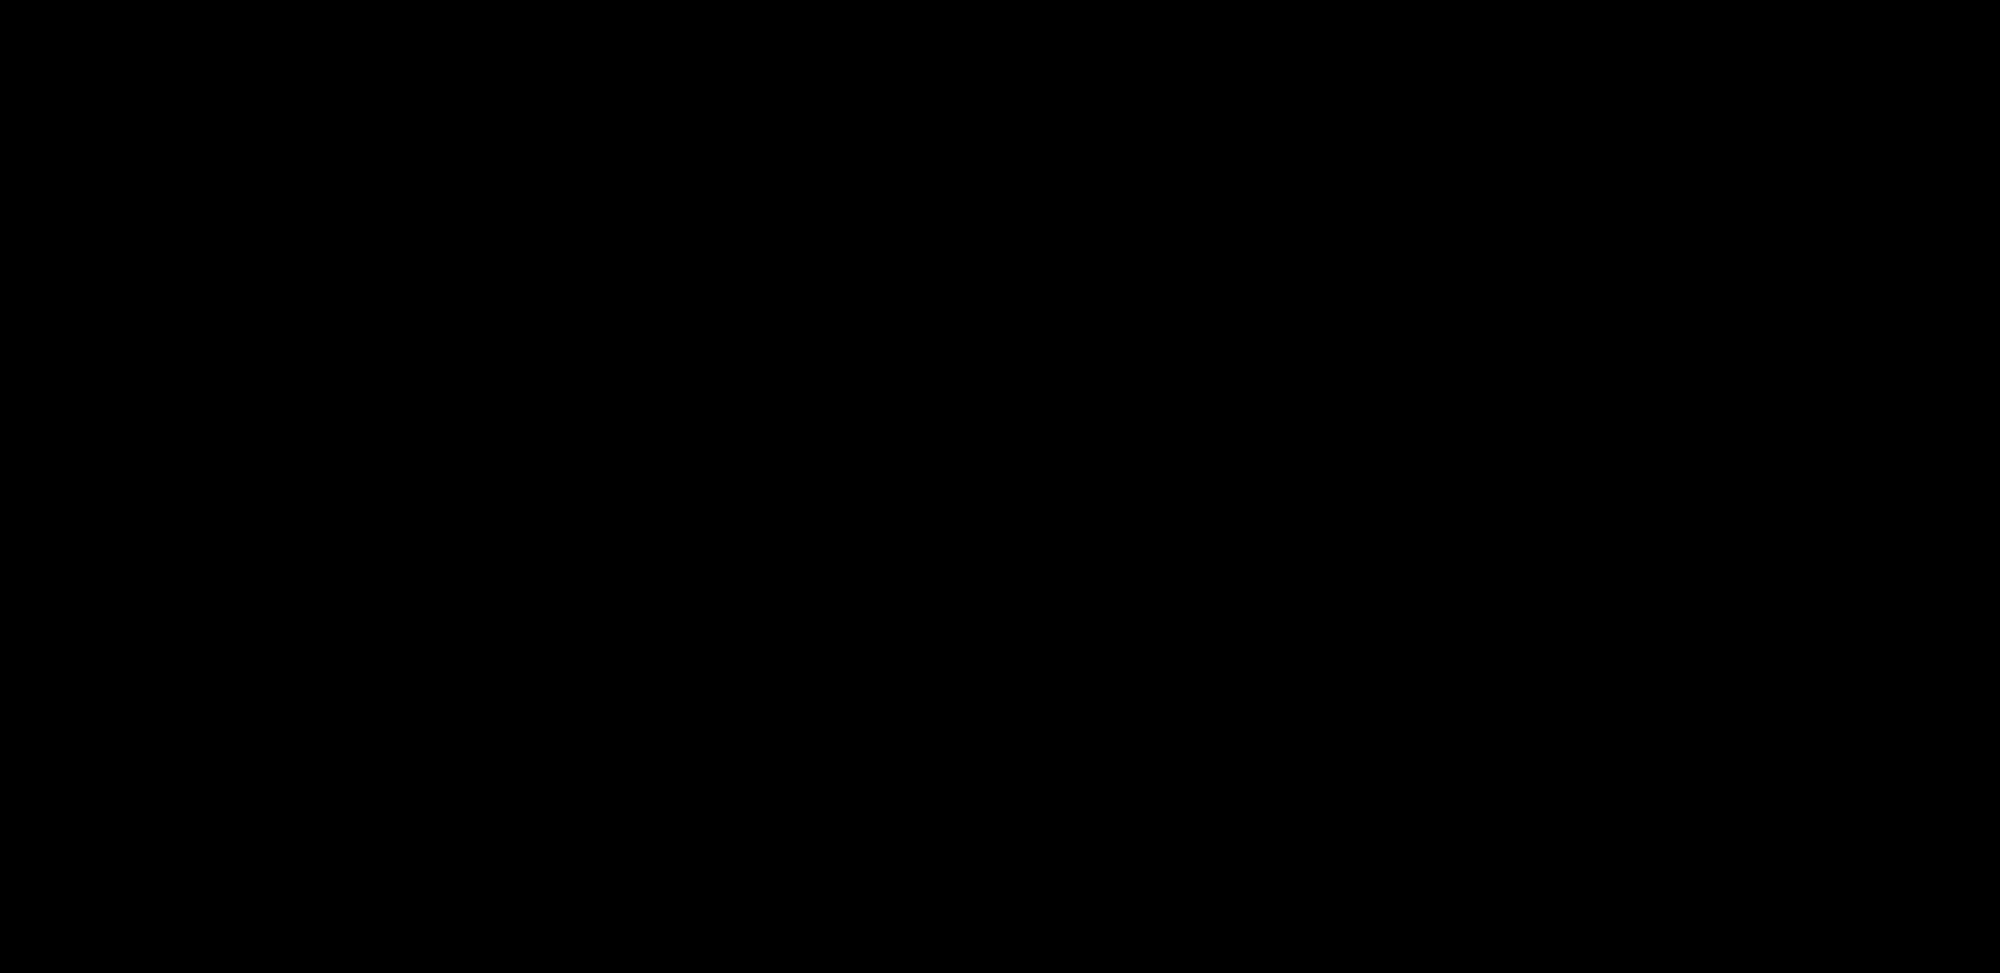 R clipart black letter. File cherokee like letters